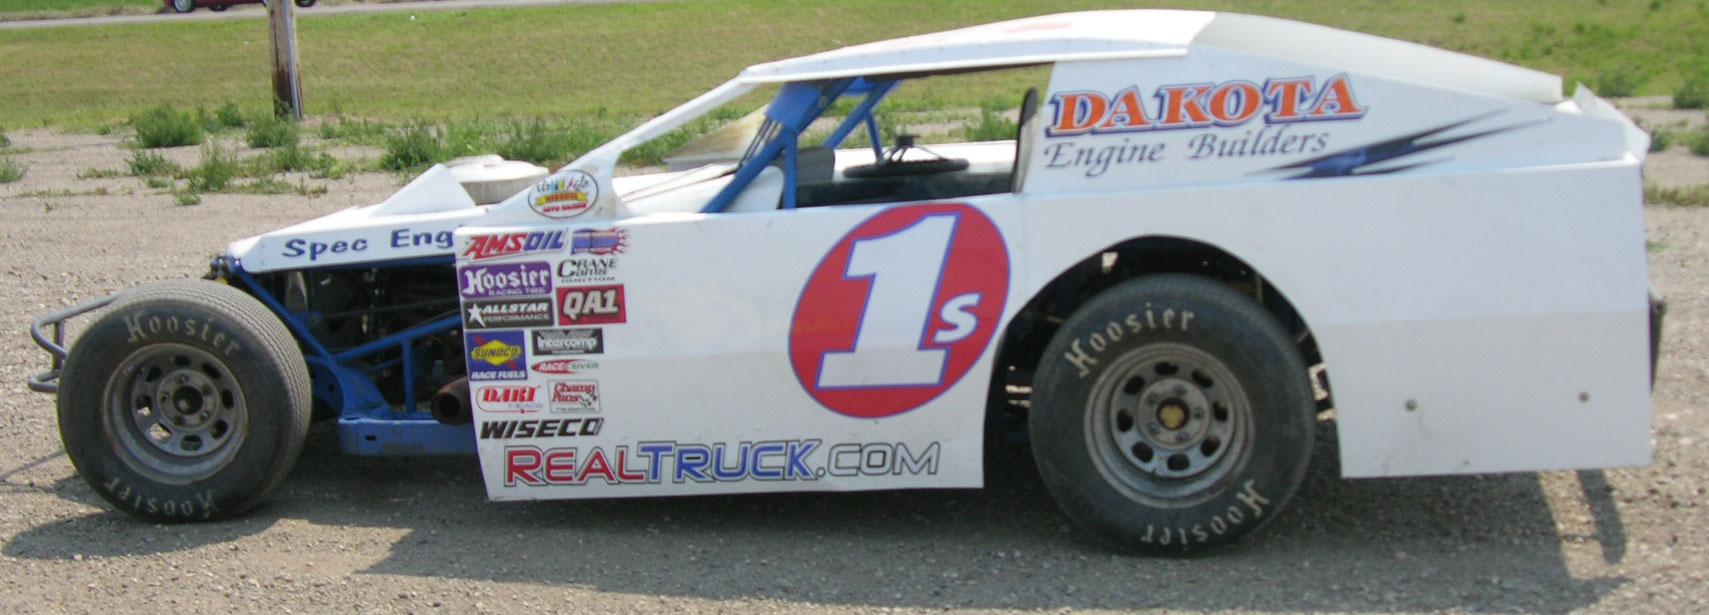 2002 Hoffman - Raced 4 times in 2007